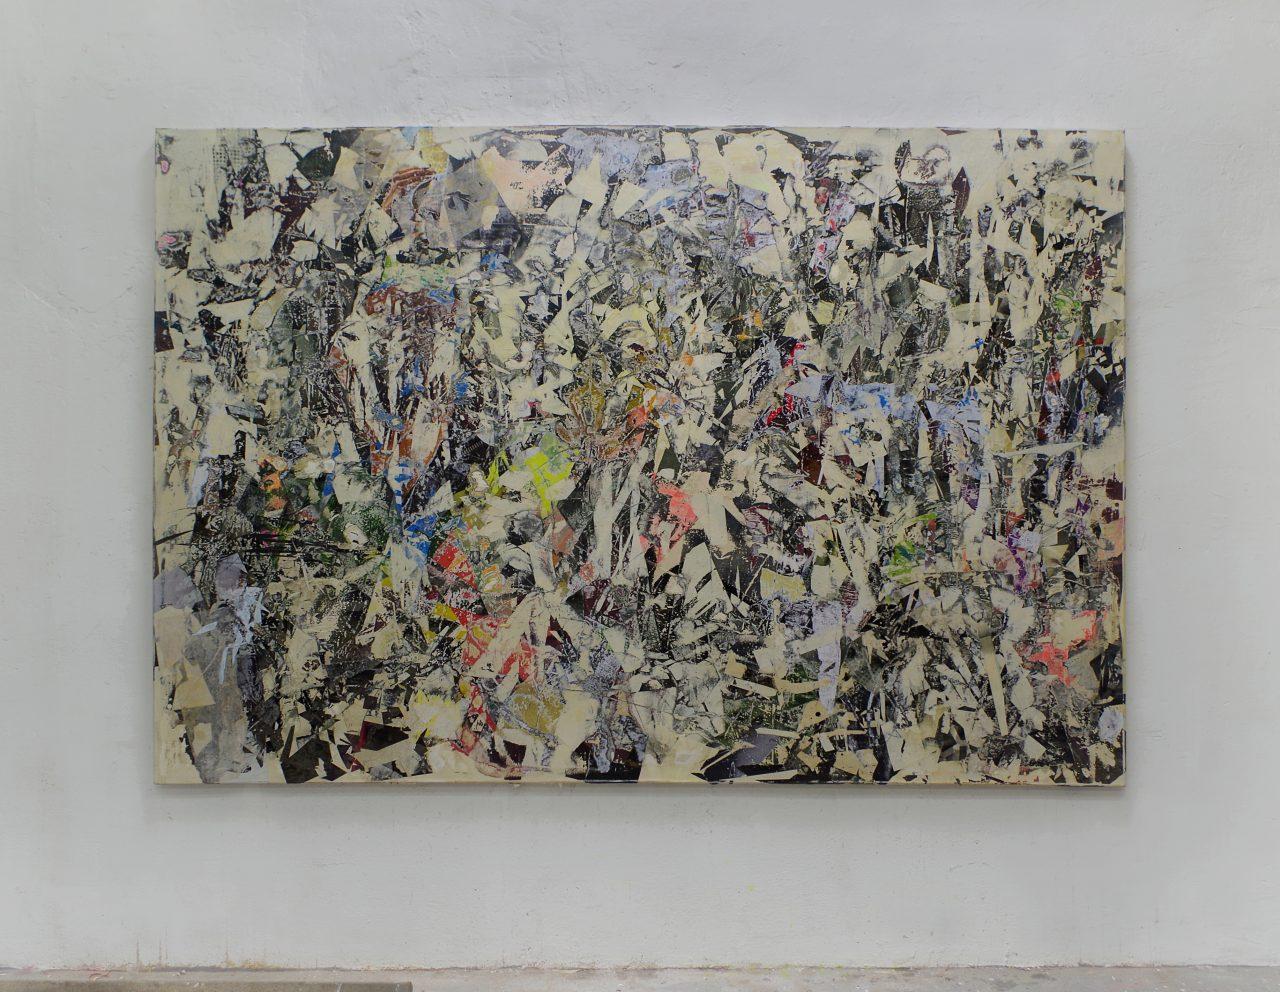 2017, Acryl, Spraypaint, Papier, Leinwand, Keilrahmen 190 x 280 cm